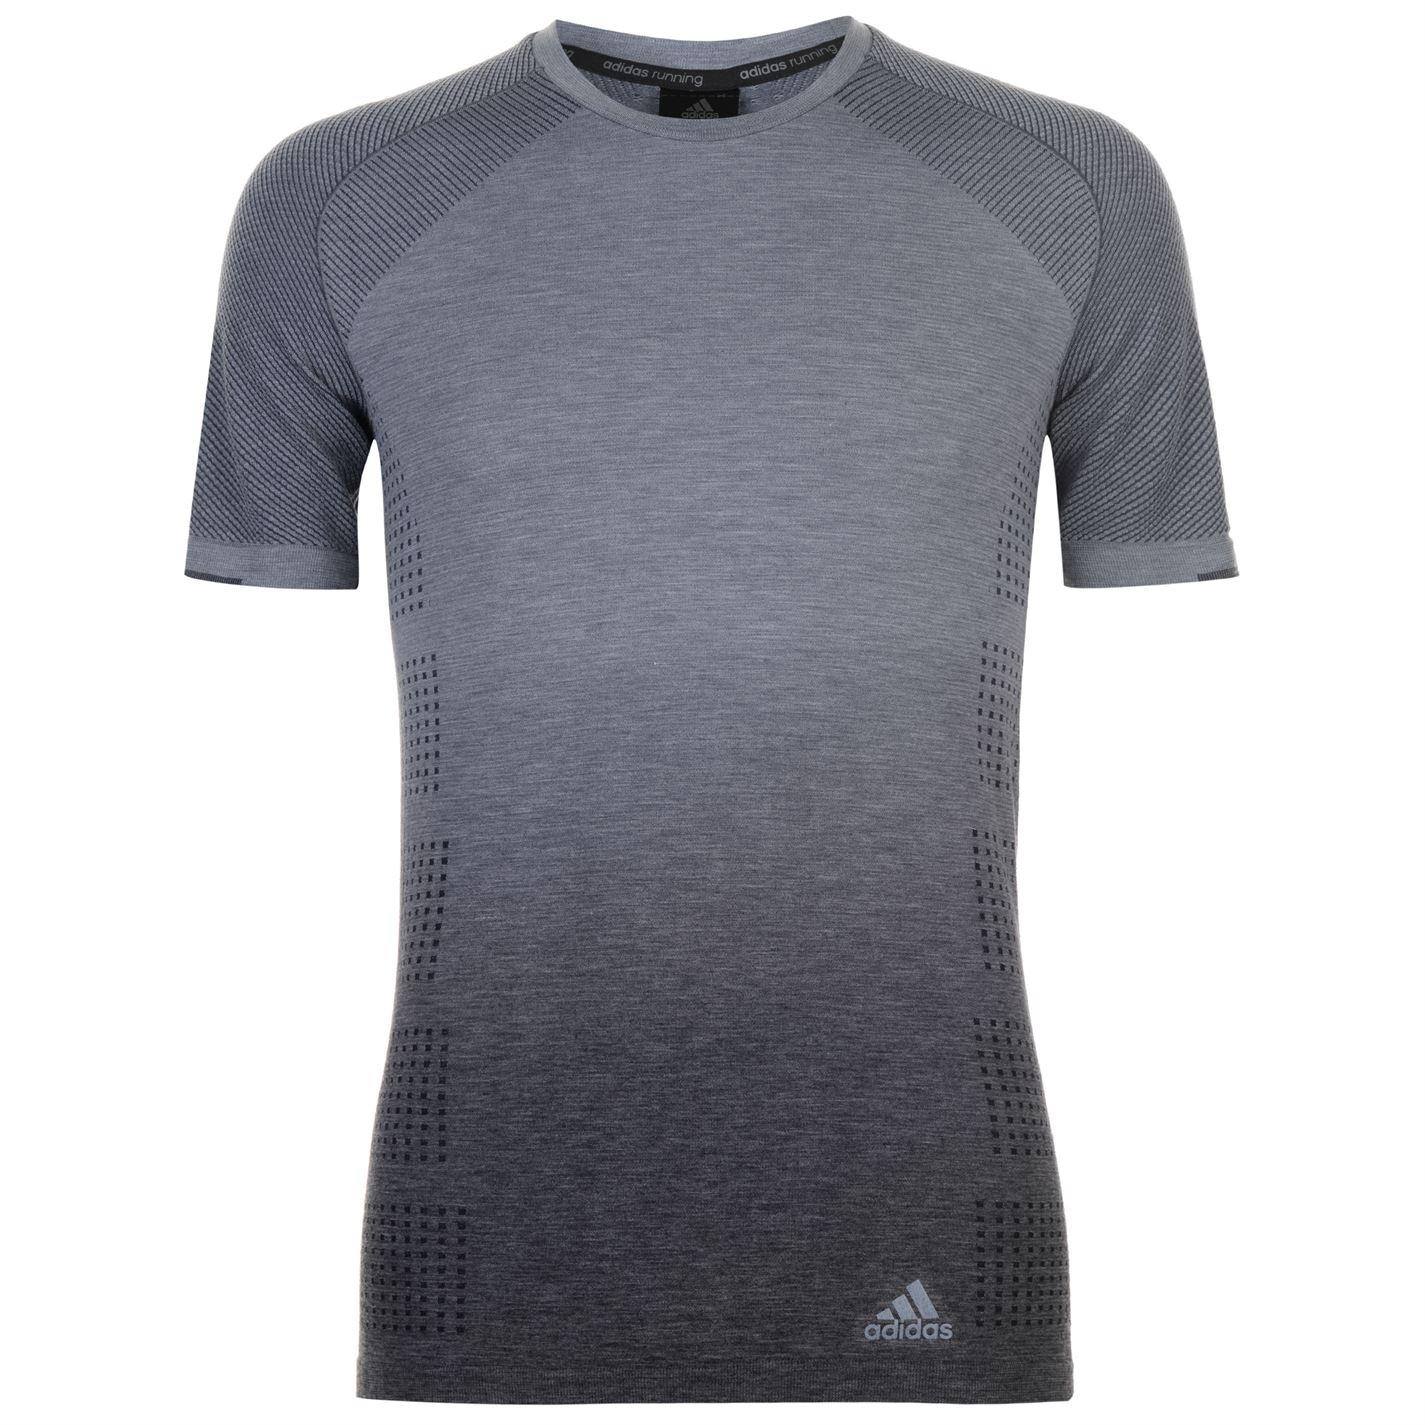 Adidas Prime Knit T Shirt Mens